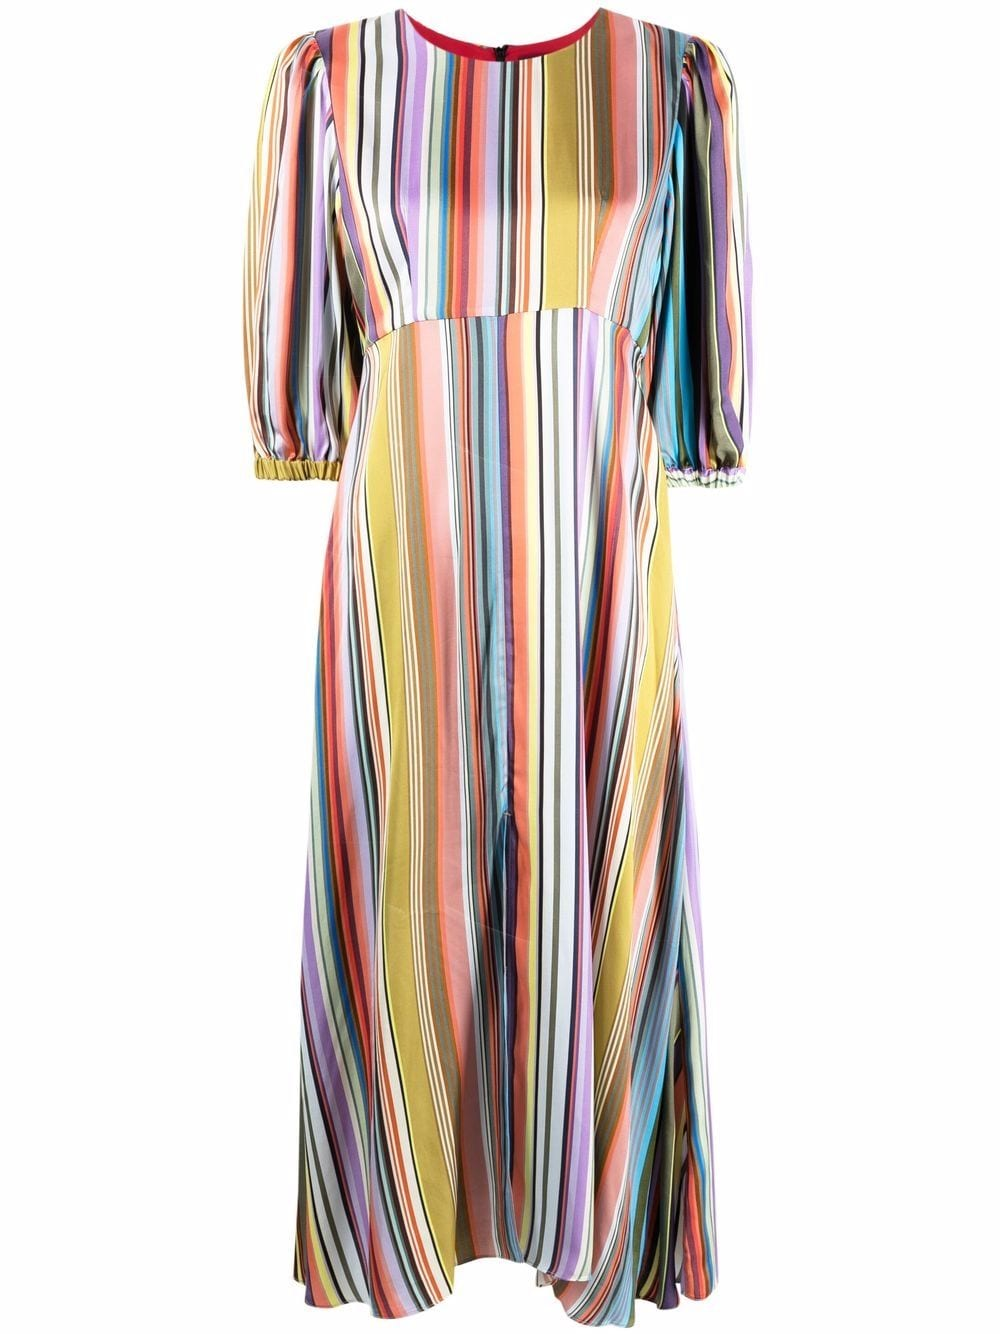 PS PAUL SMITH   Dress   W2R-449D-F3074892